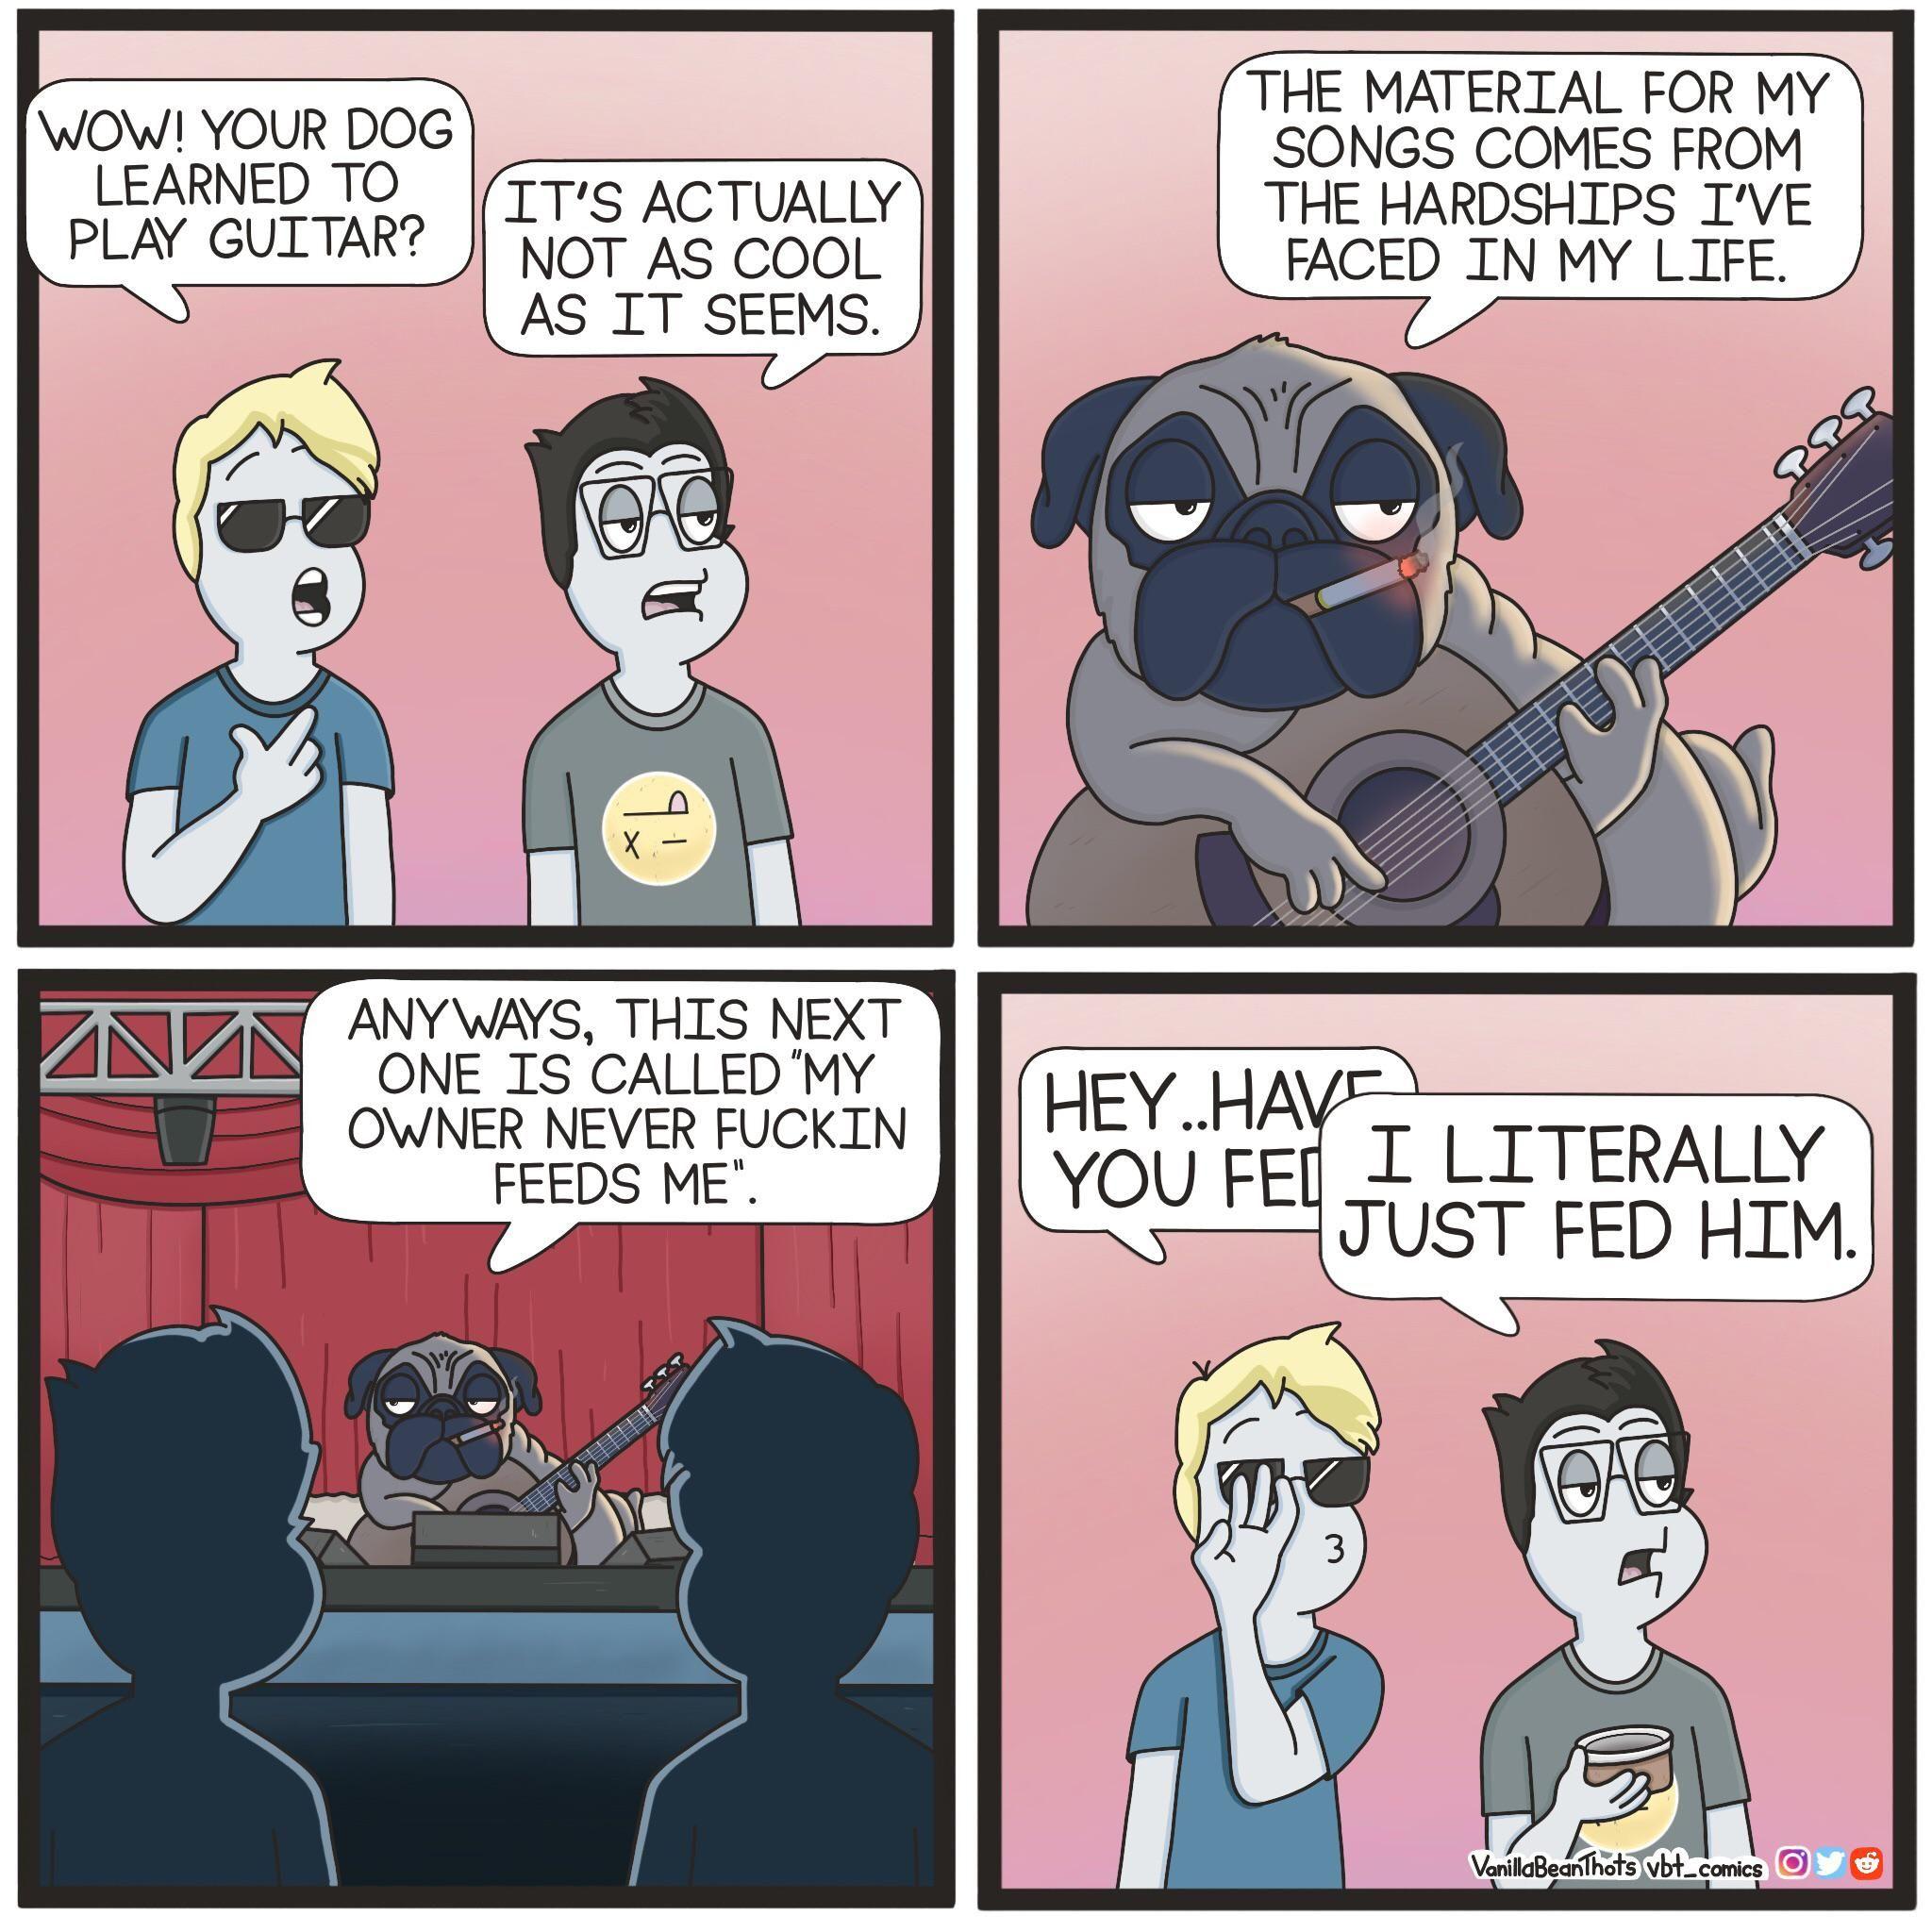 Bones, Pugs, and Harmony